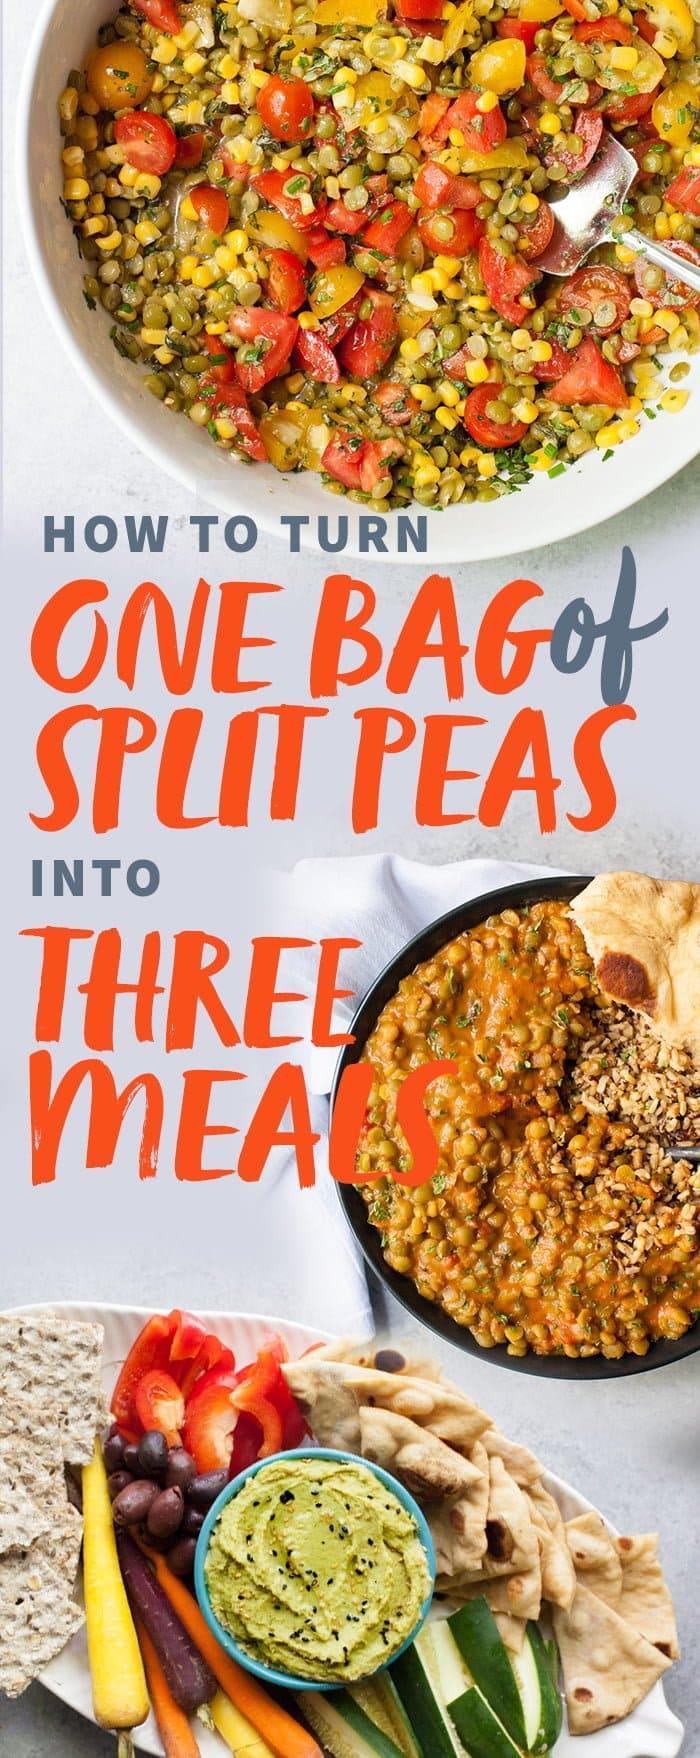 One Bag of Split Peas, Three Meals